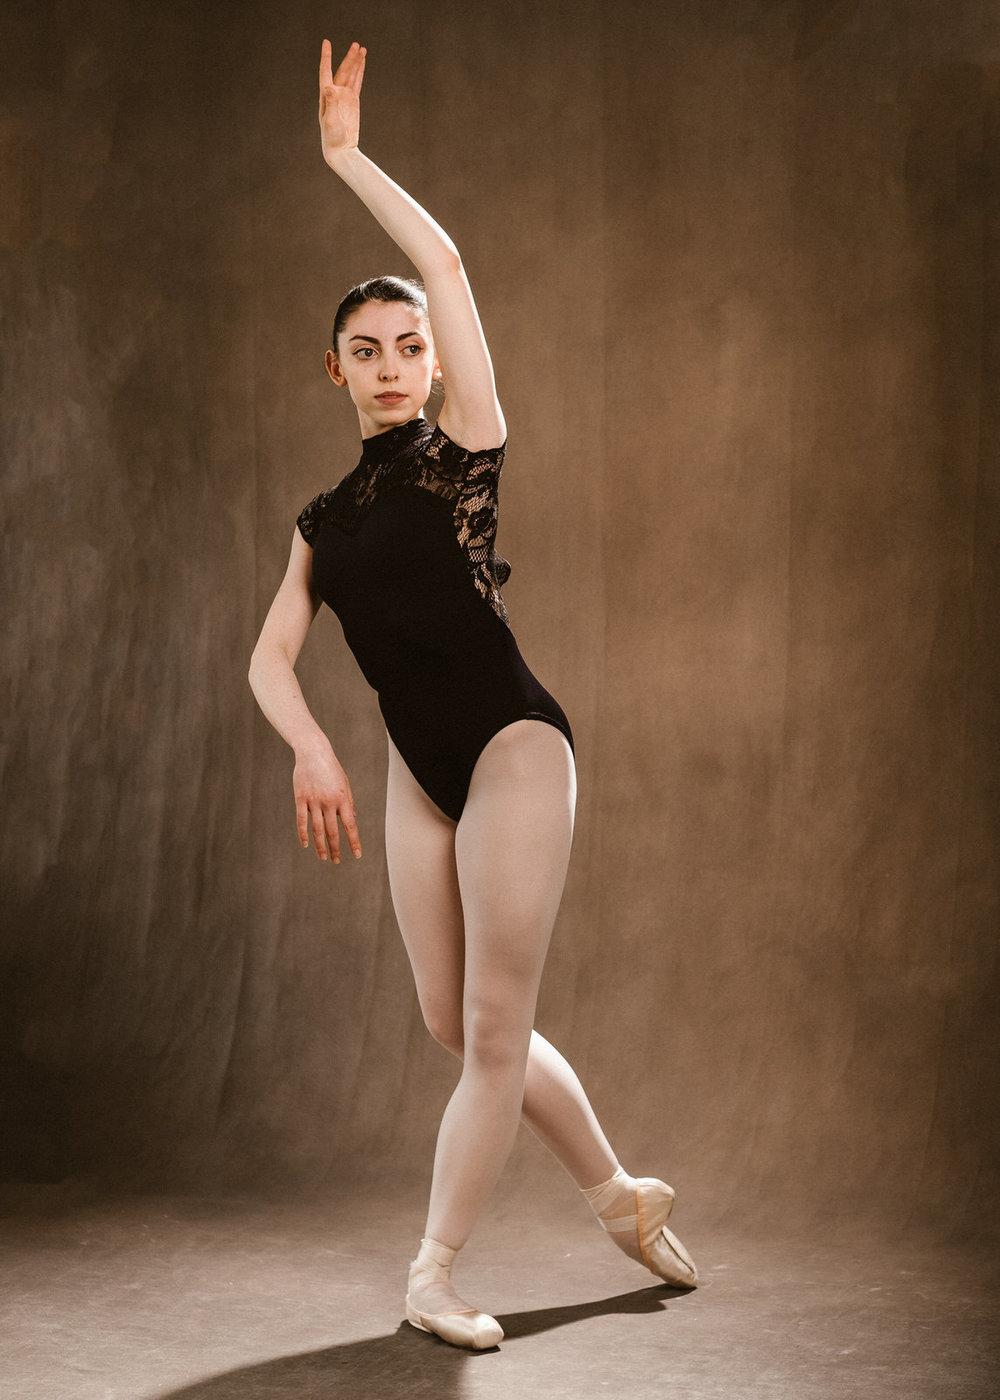 Sarah_Nolan_Ballet_010.jpg